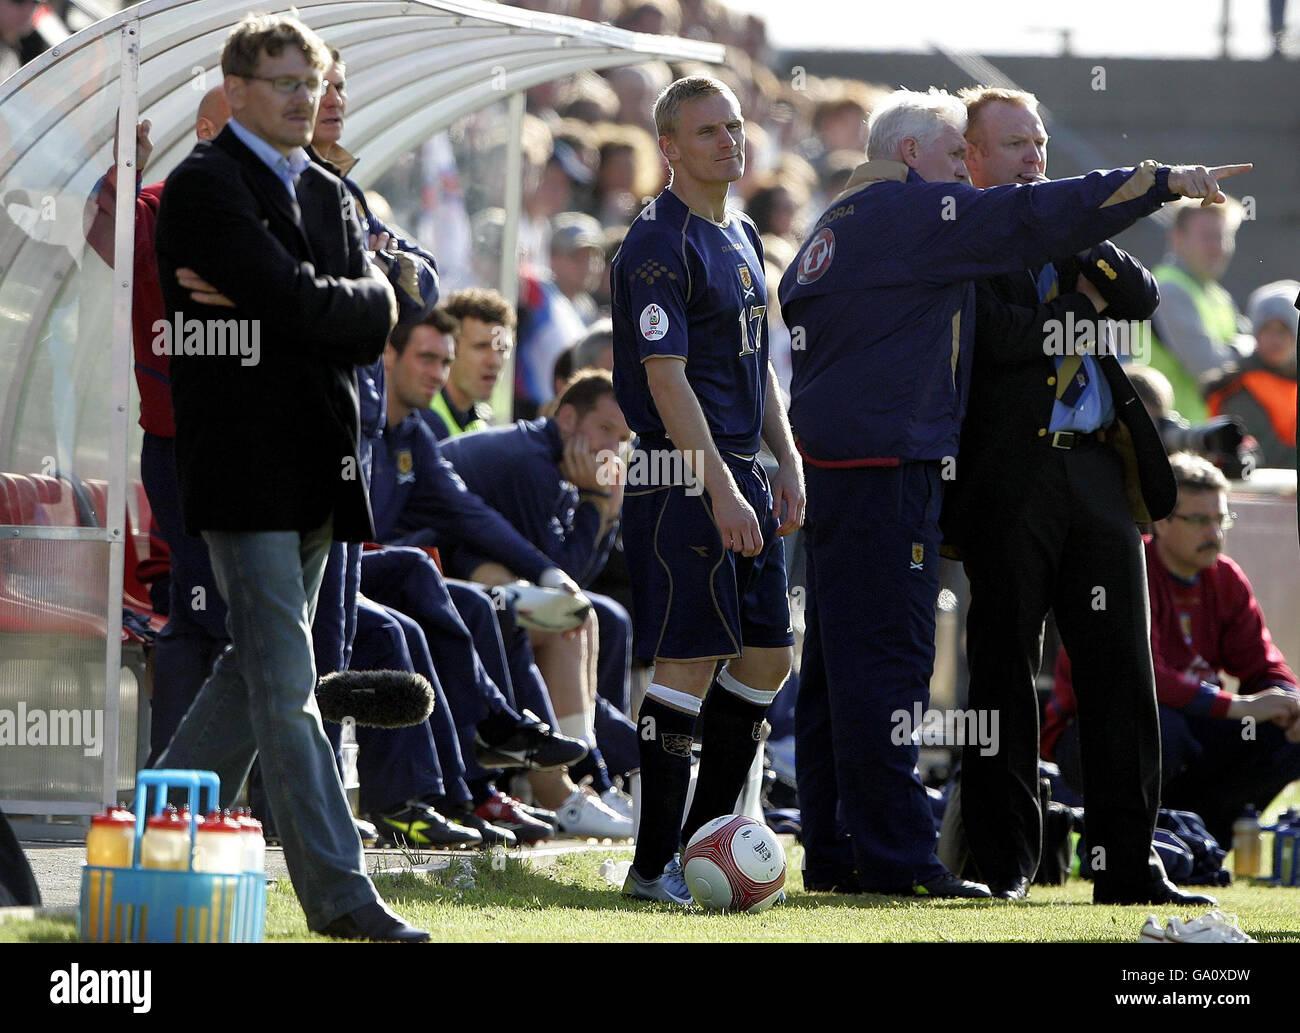 Soccer - Euro 2008 Qualifying - Group B - Faroe Island v Scotland - Svangaskard Stadium - Stock Image